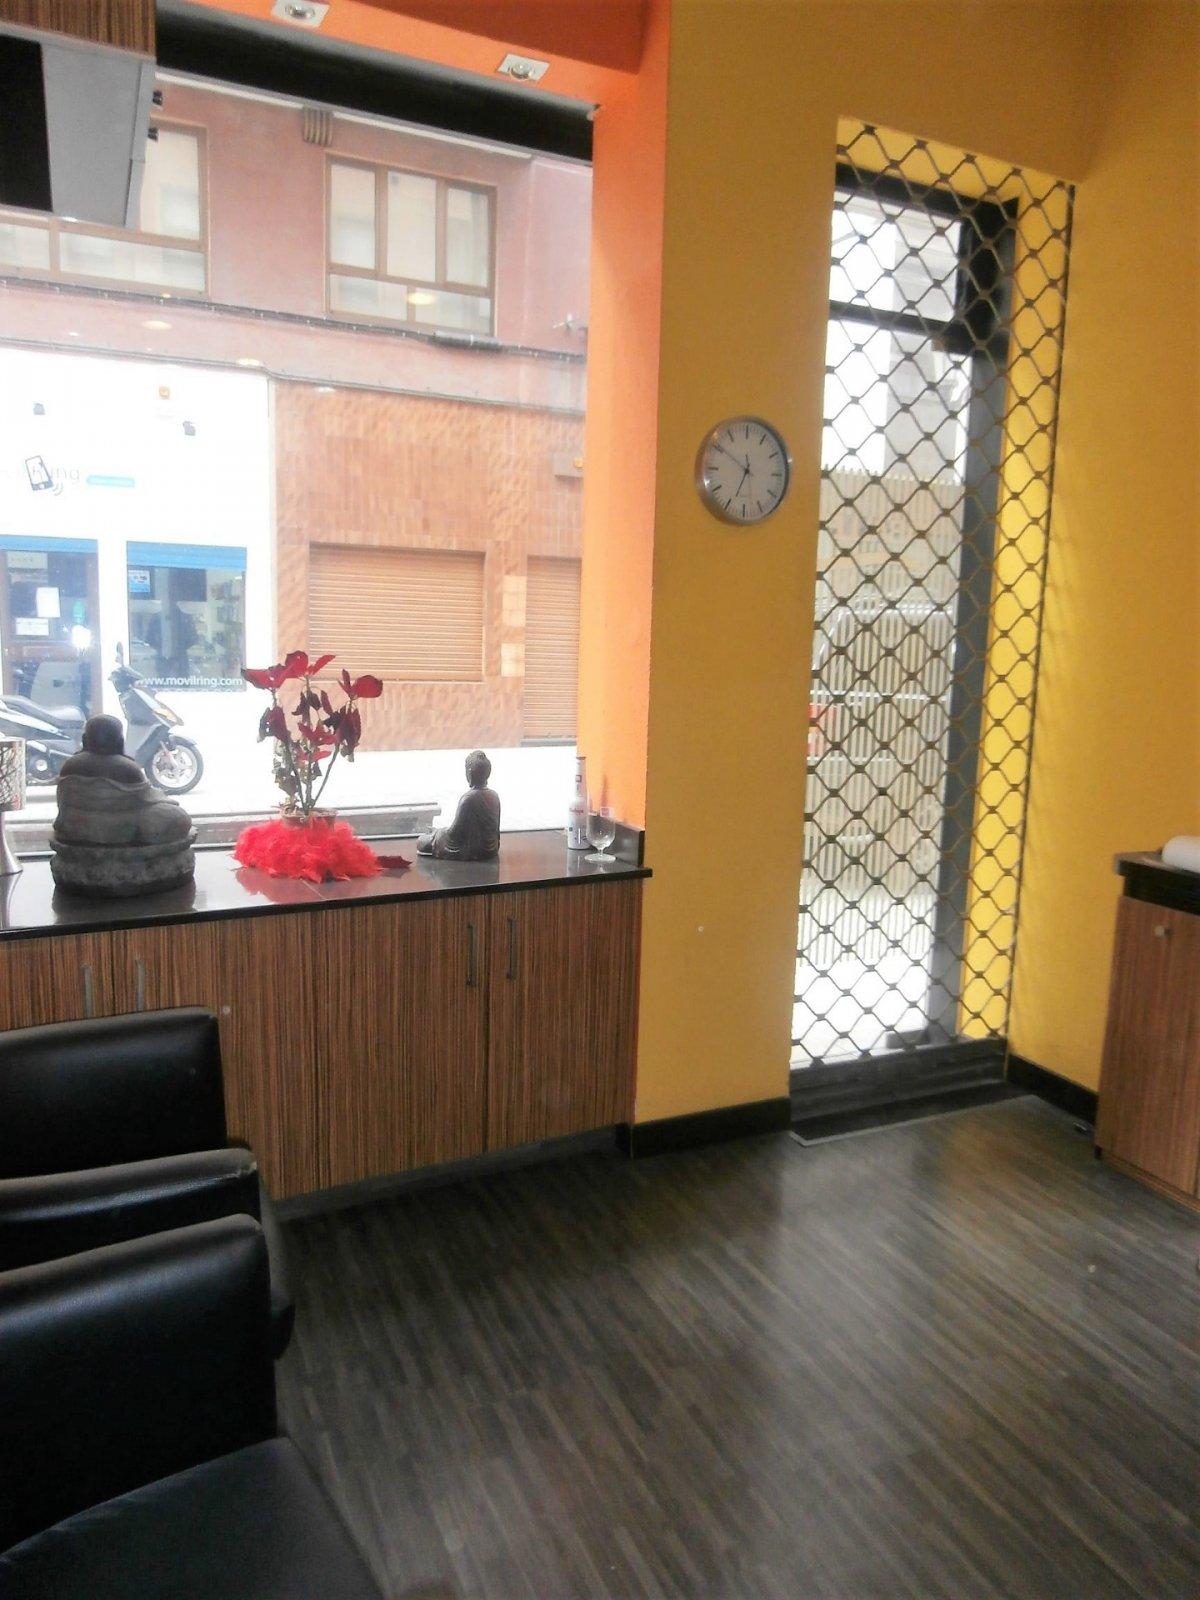 Local instalado como peluqueria - imagenInmueble15